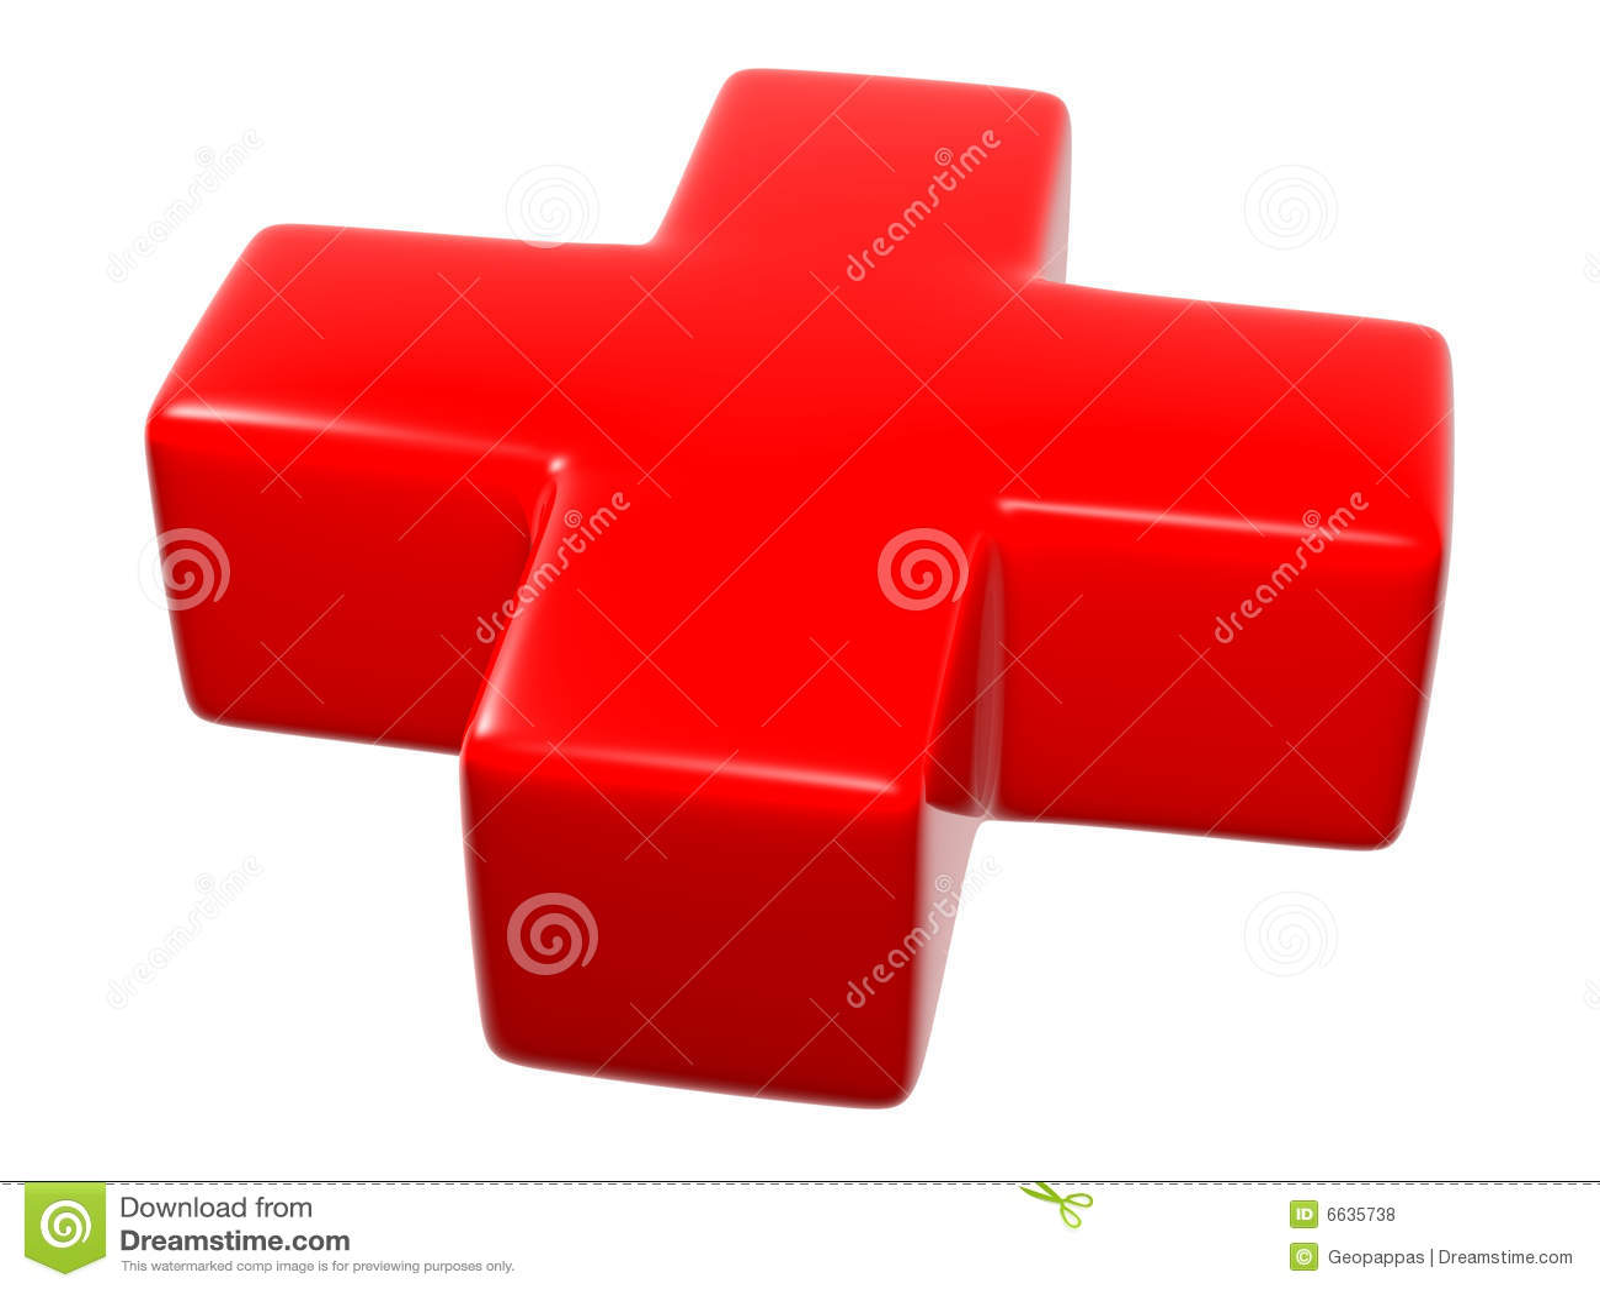 Rescue croce rossa - 2 5